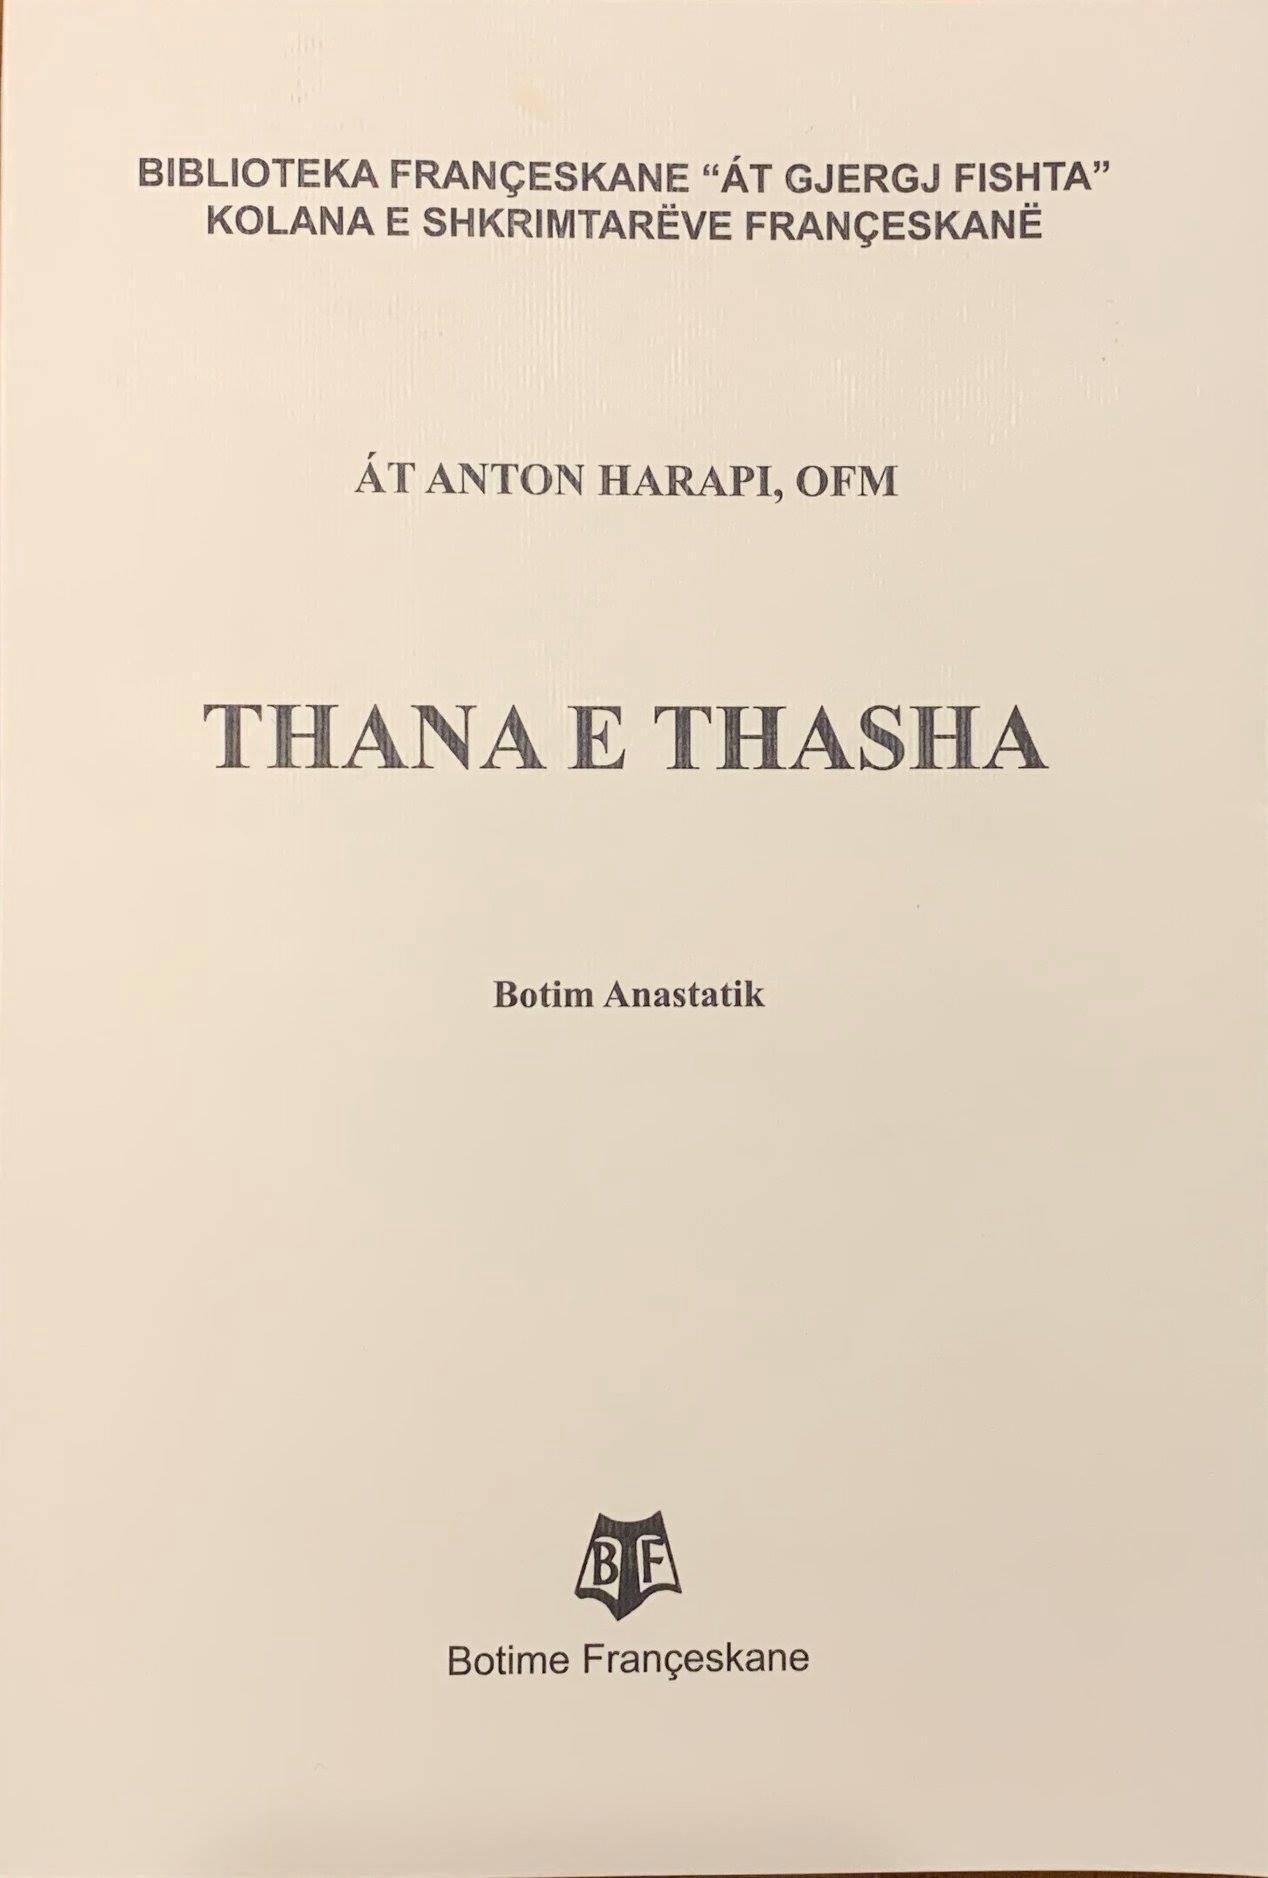 Thana e Thasha